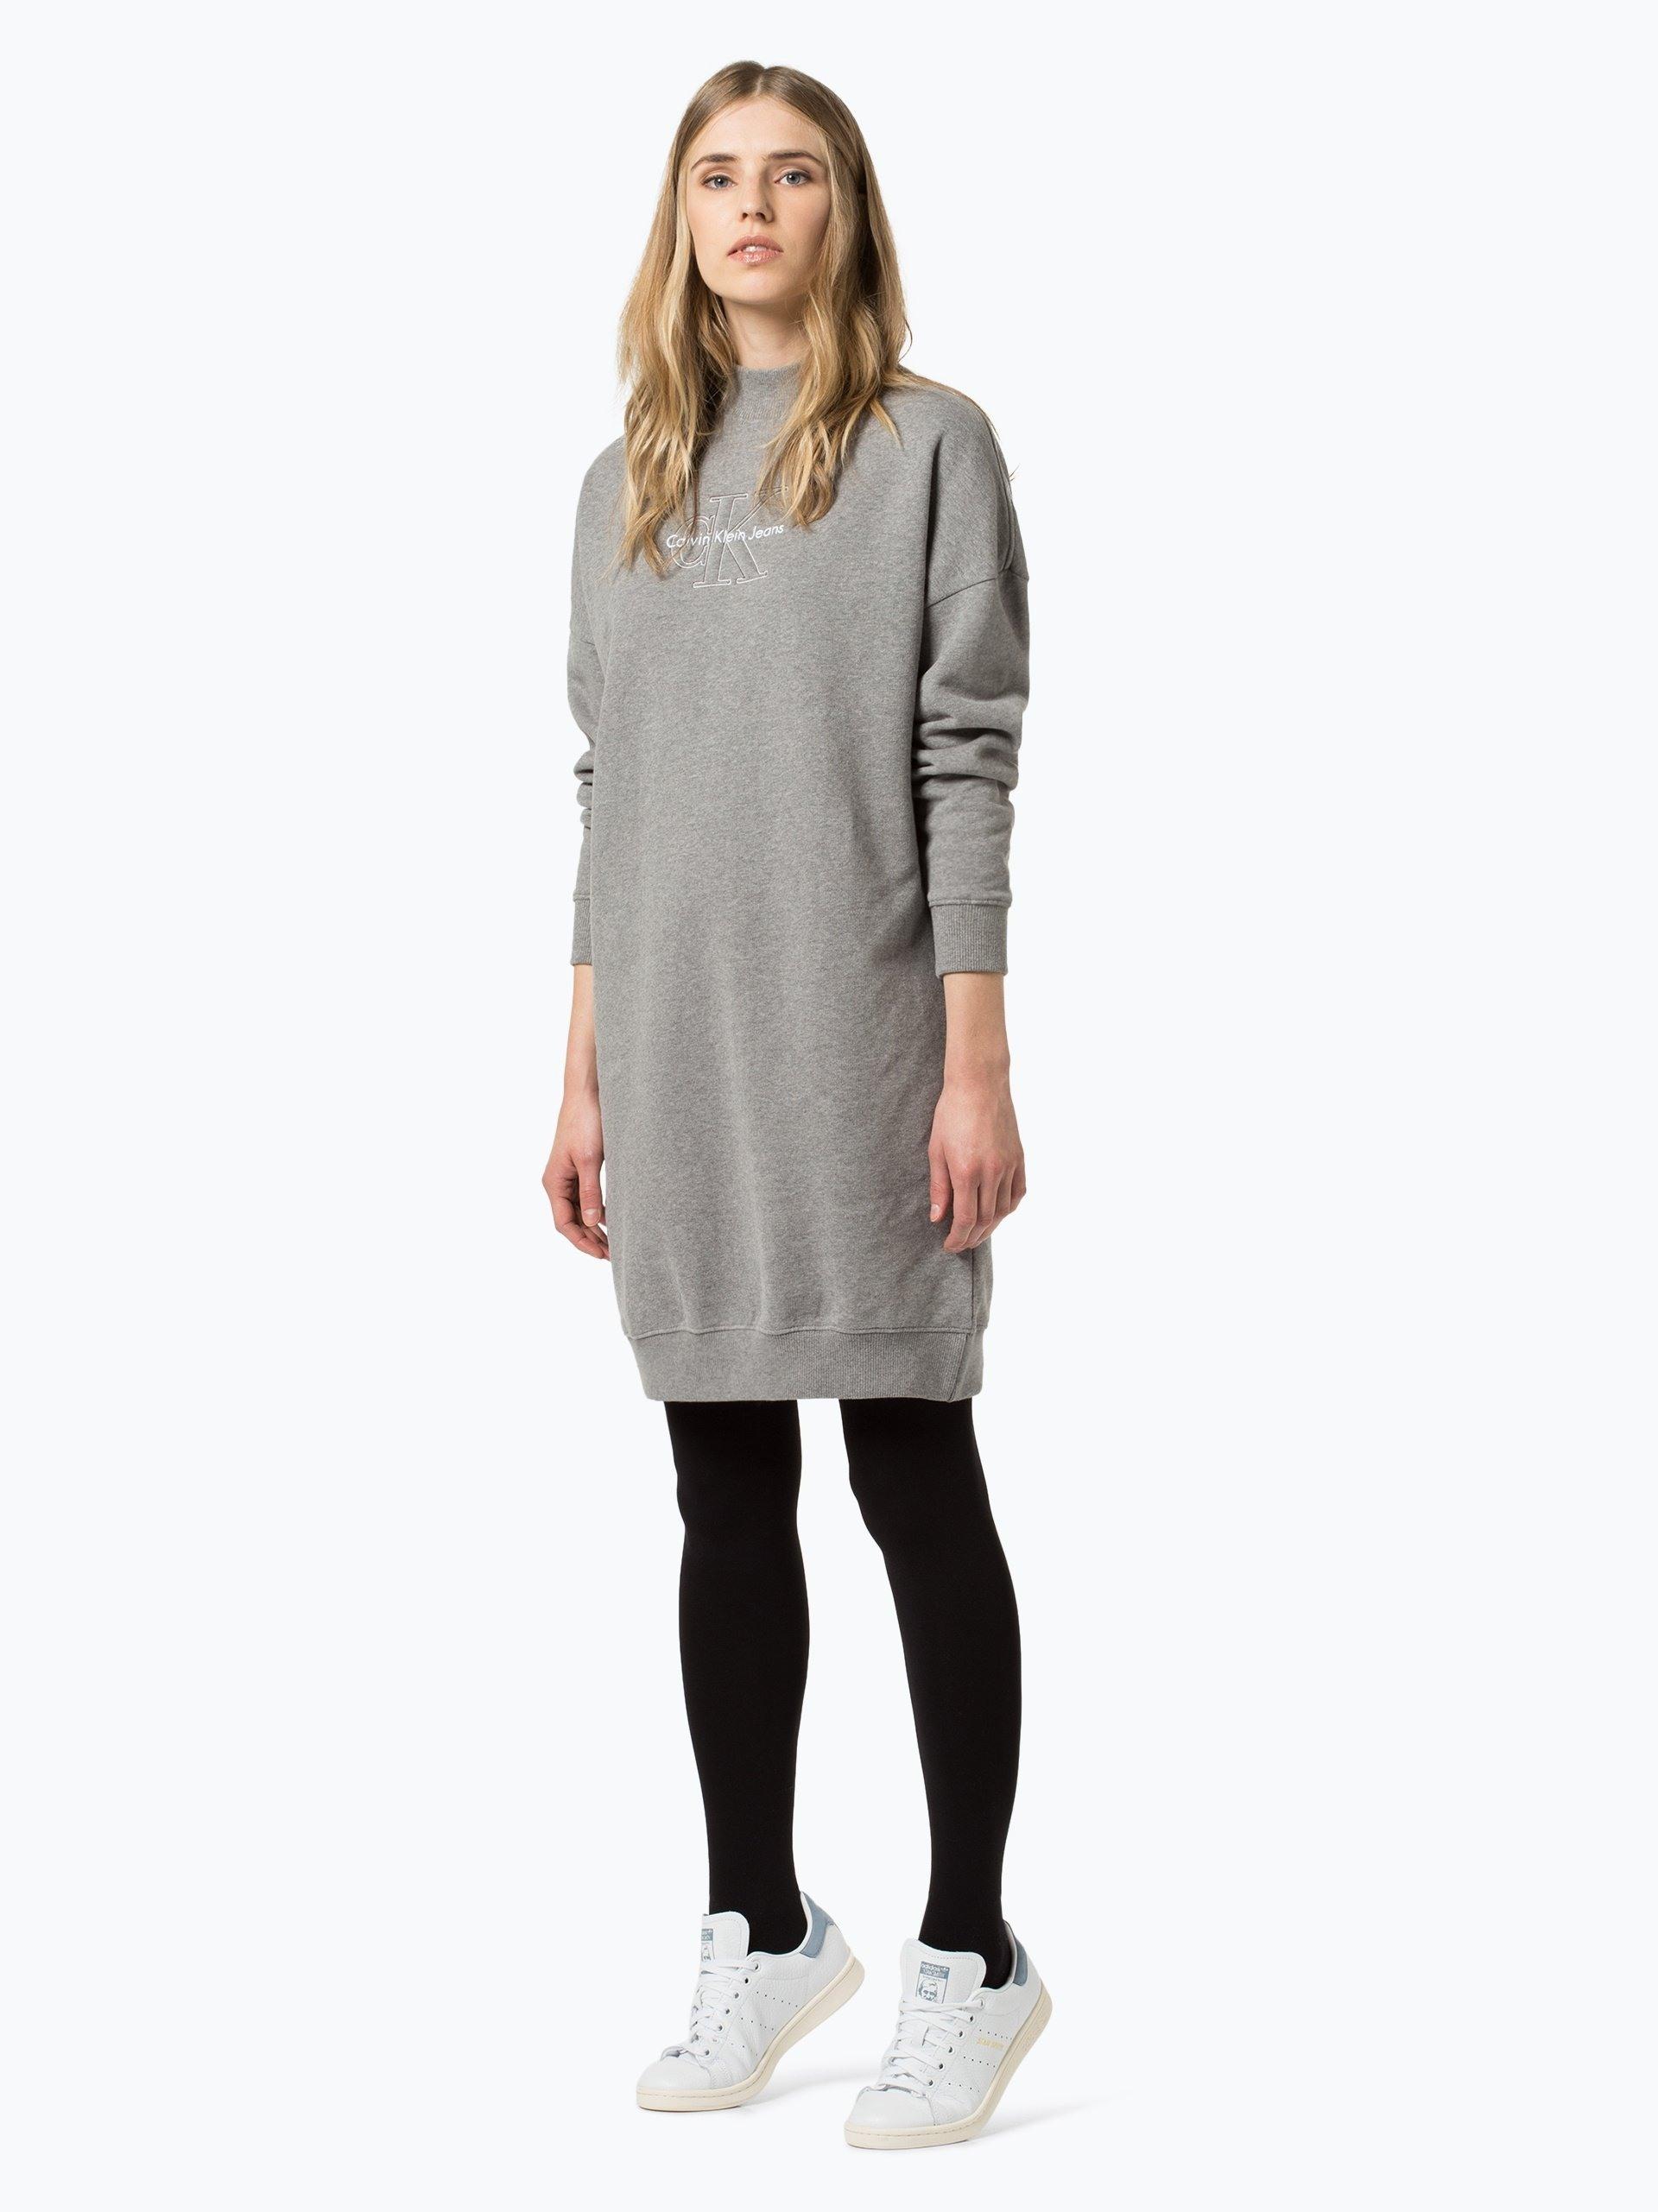 Formal Elegant Kleid Grau Lang für 2019Formal Schön Kleid Grau Lang Design